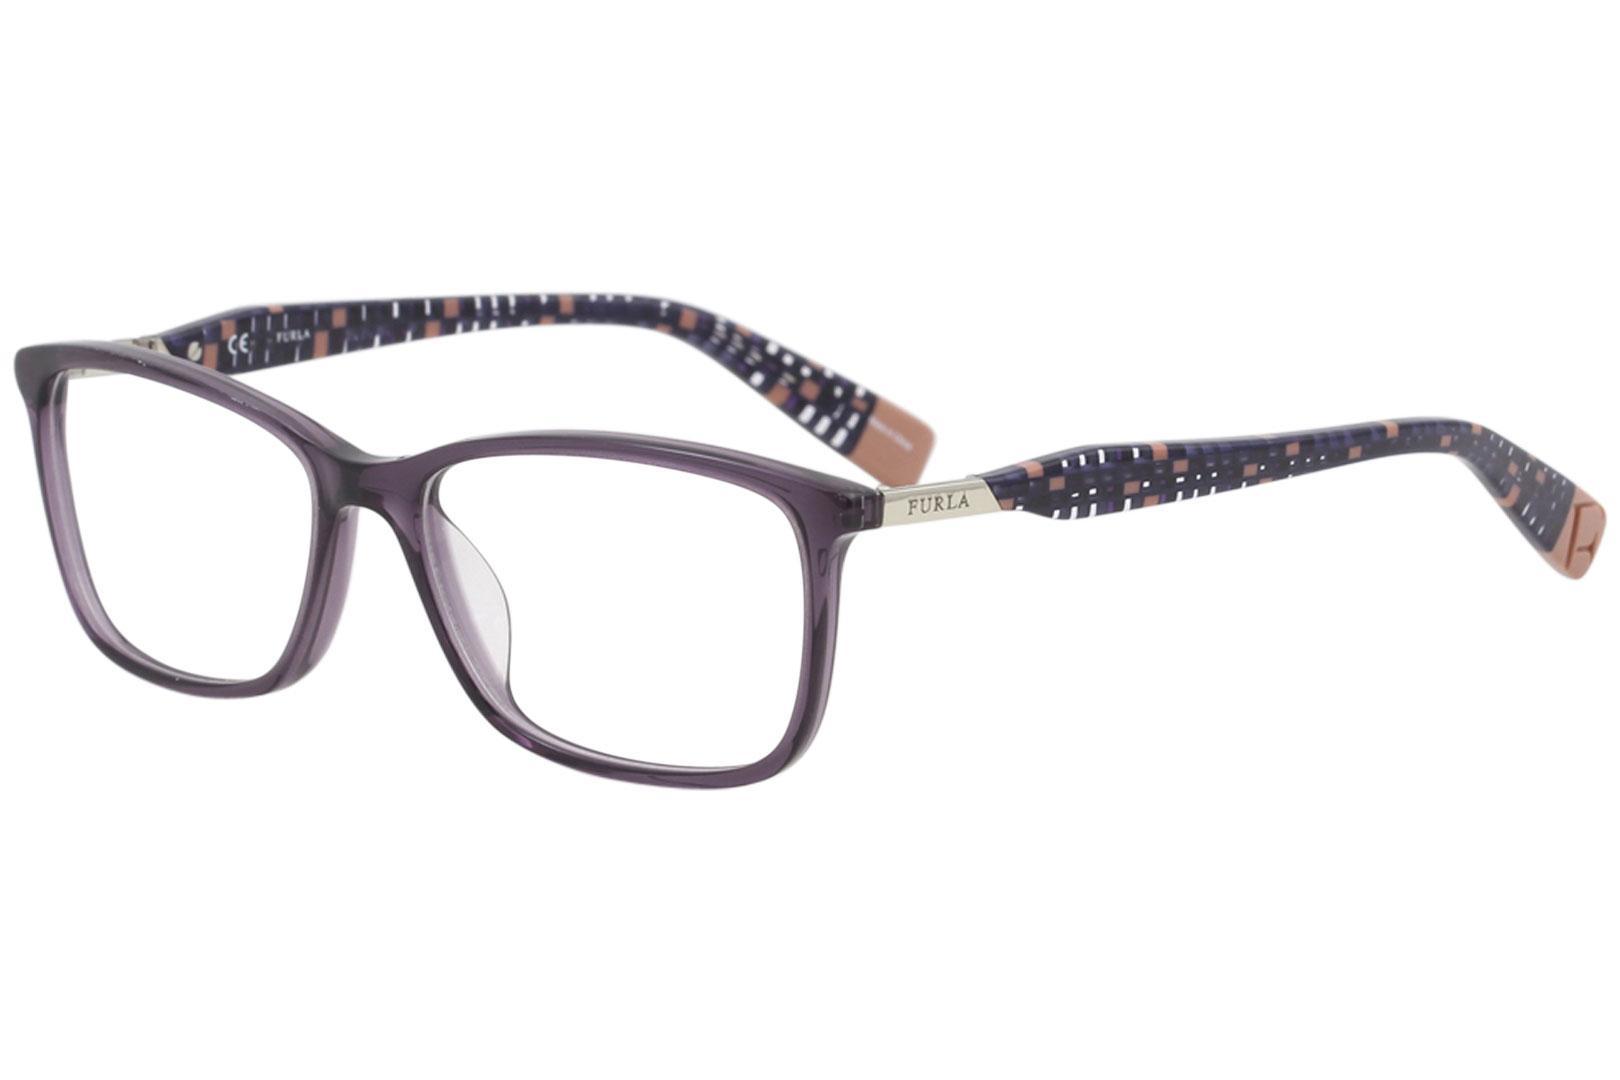 Image of Furla Women's Eyeglasses VFU028 VFU/028 0916 Purple Full Rim Optical Frame 53mm - Purple   0916 - Lens 53 Bridge 16 B 36 ED 67 Temple 135mm